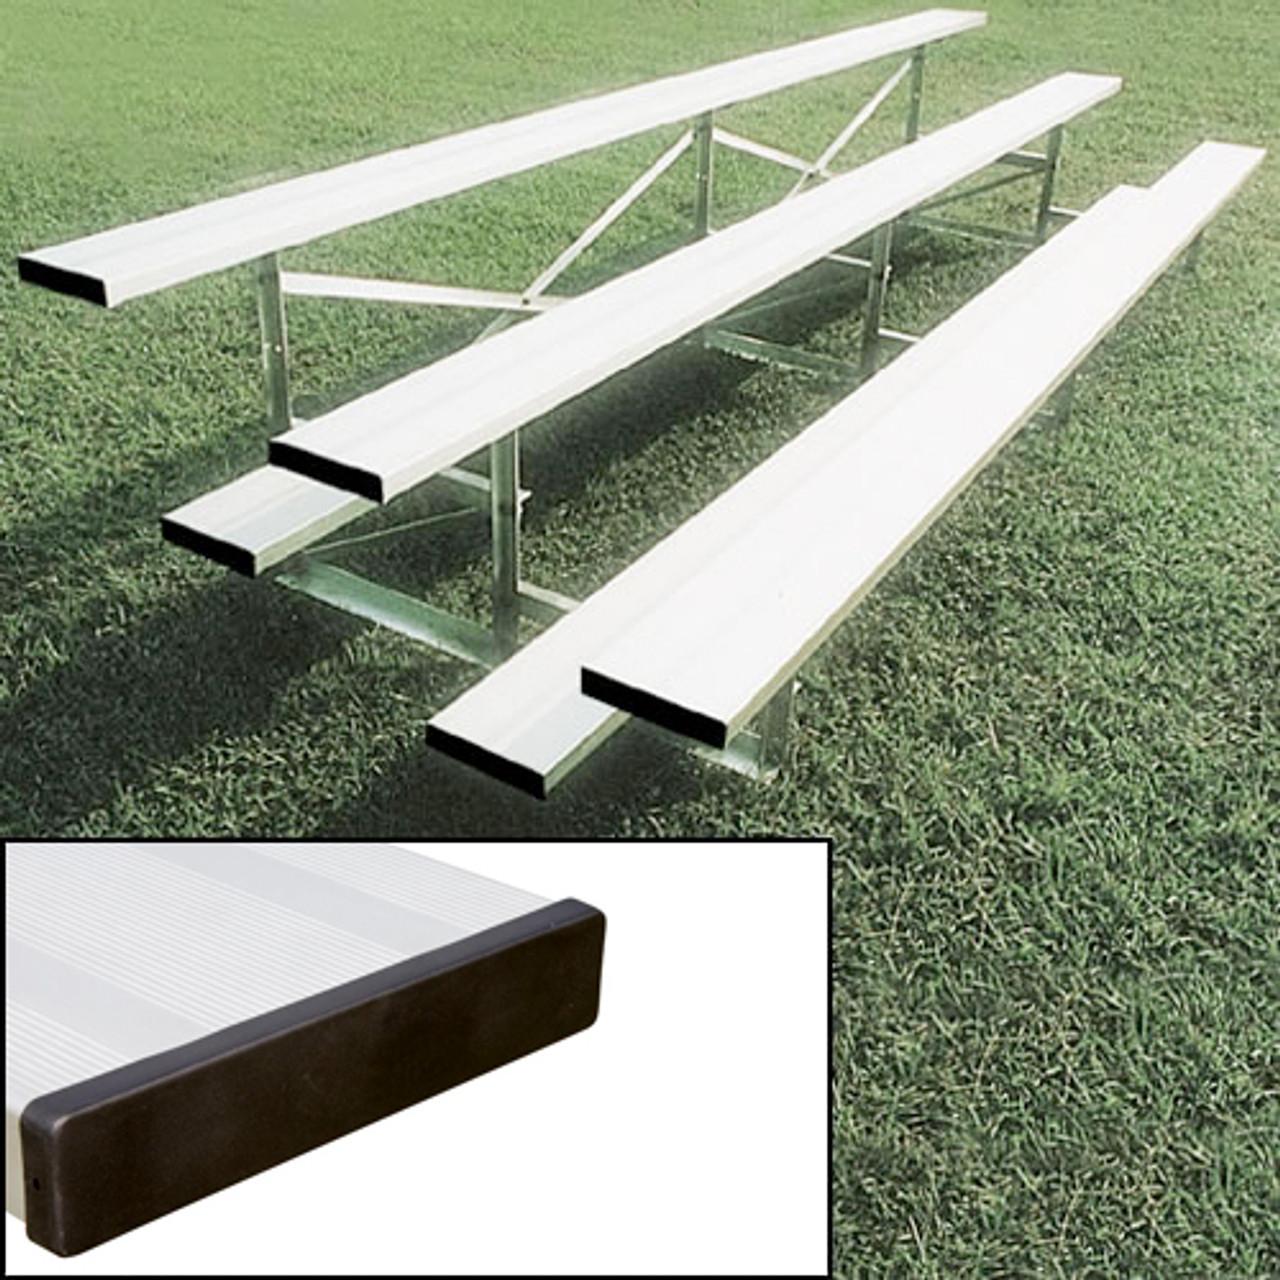 2 Row 21' Preferred Aluminum Bleacher (seats 28)